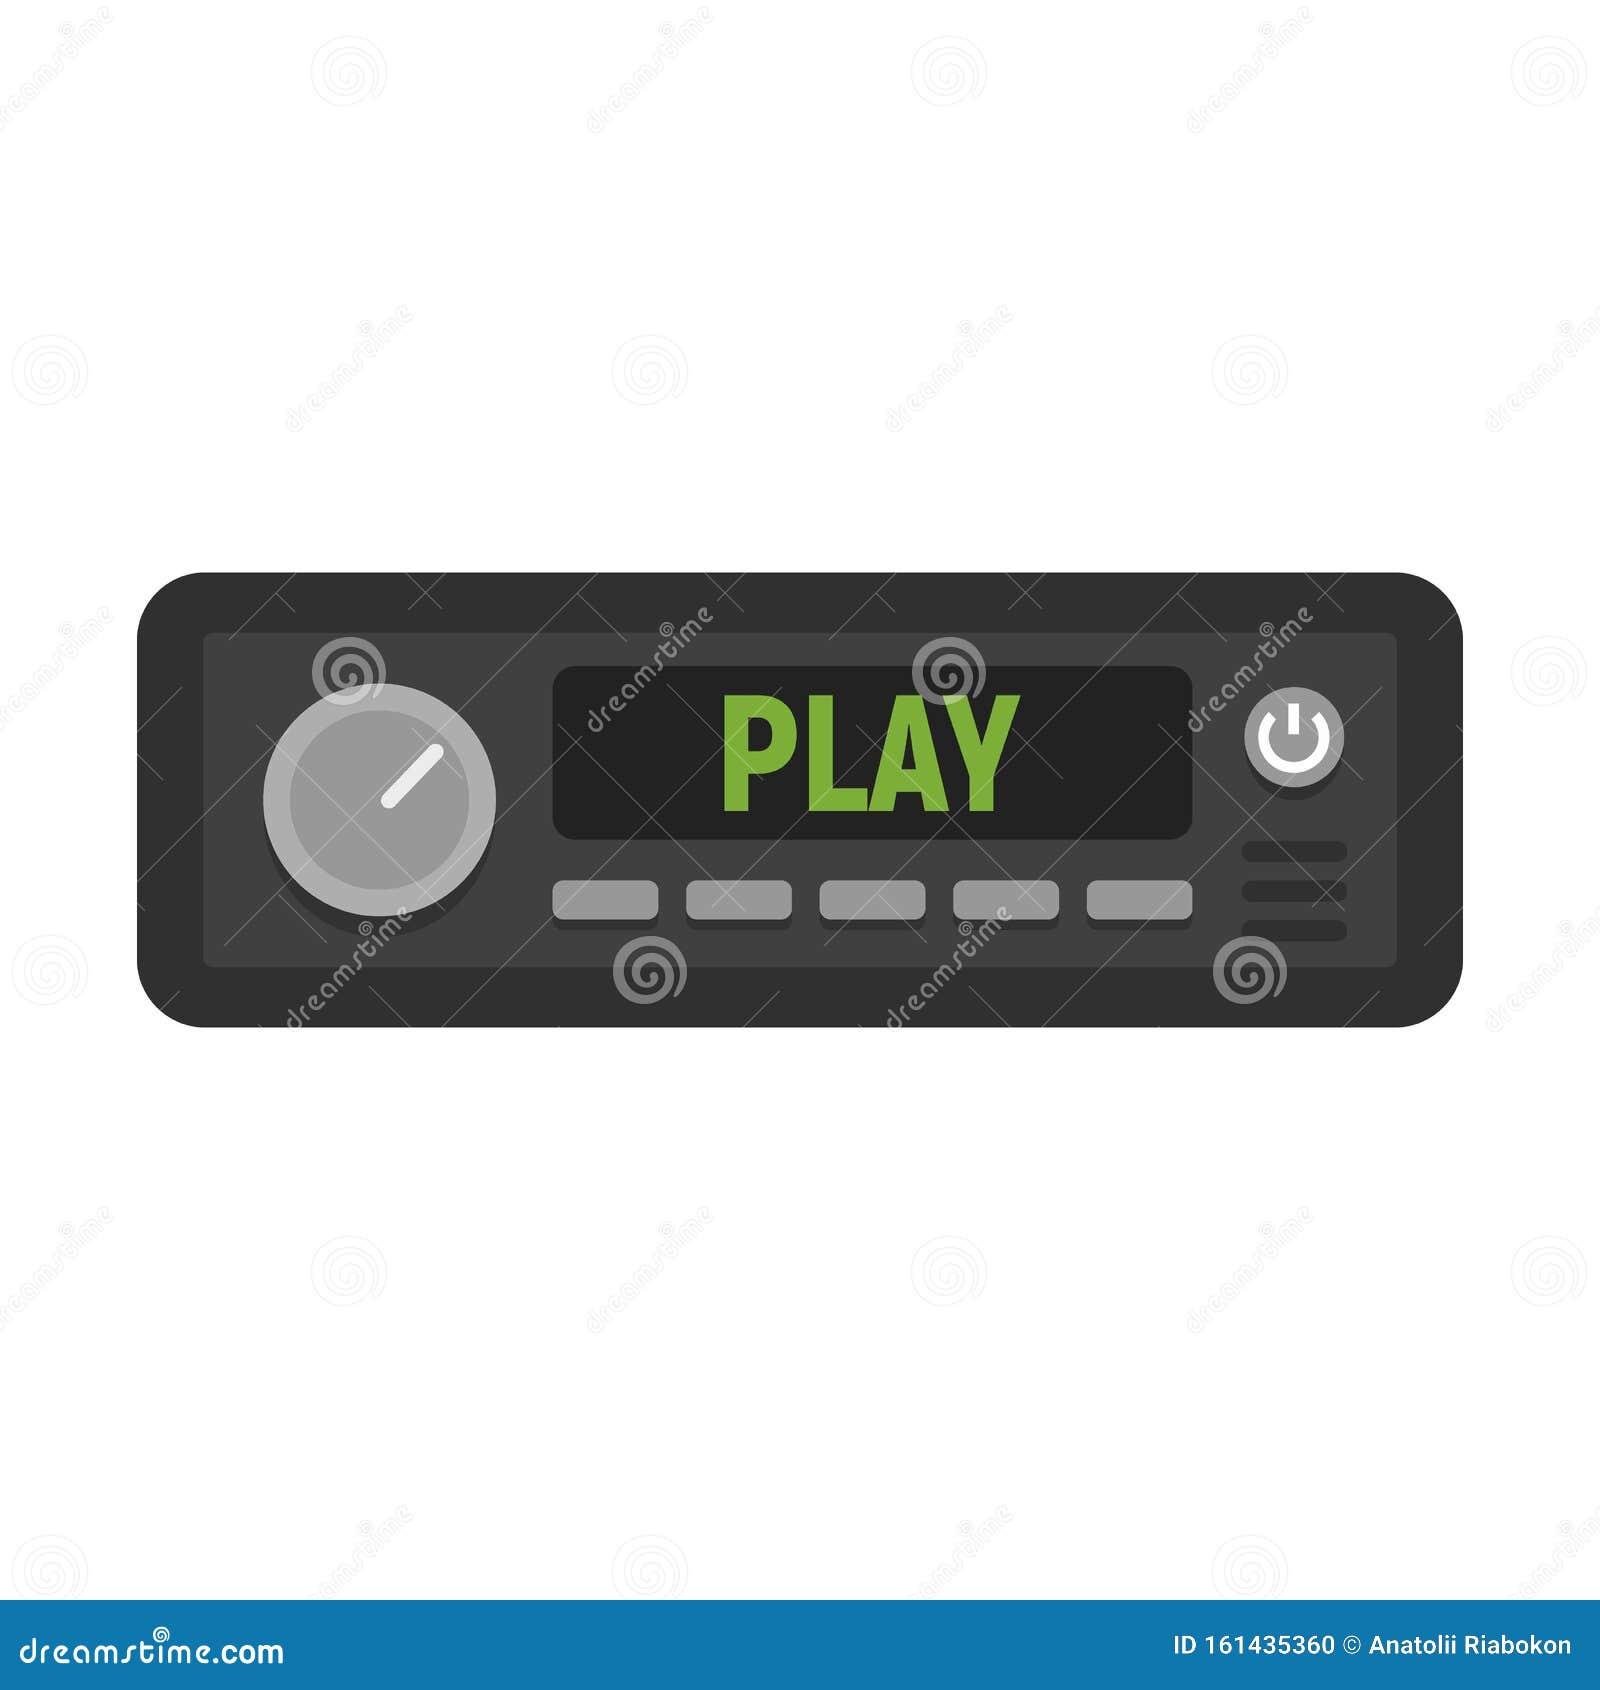 CircuitPython Audio Out | CircuitPython Essentials | Adafruit Learning  System